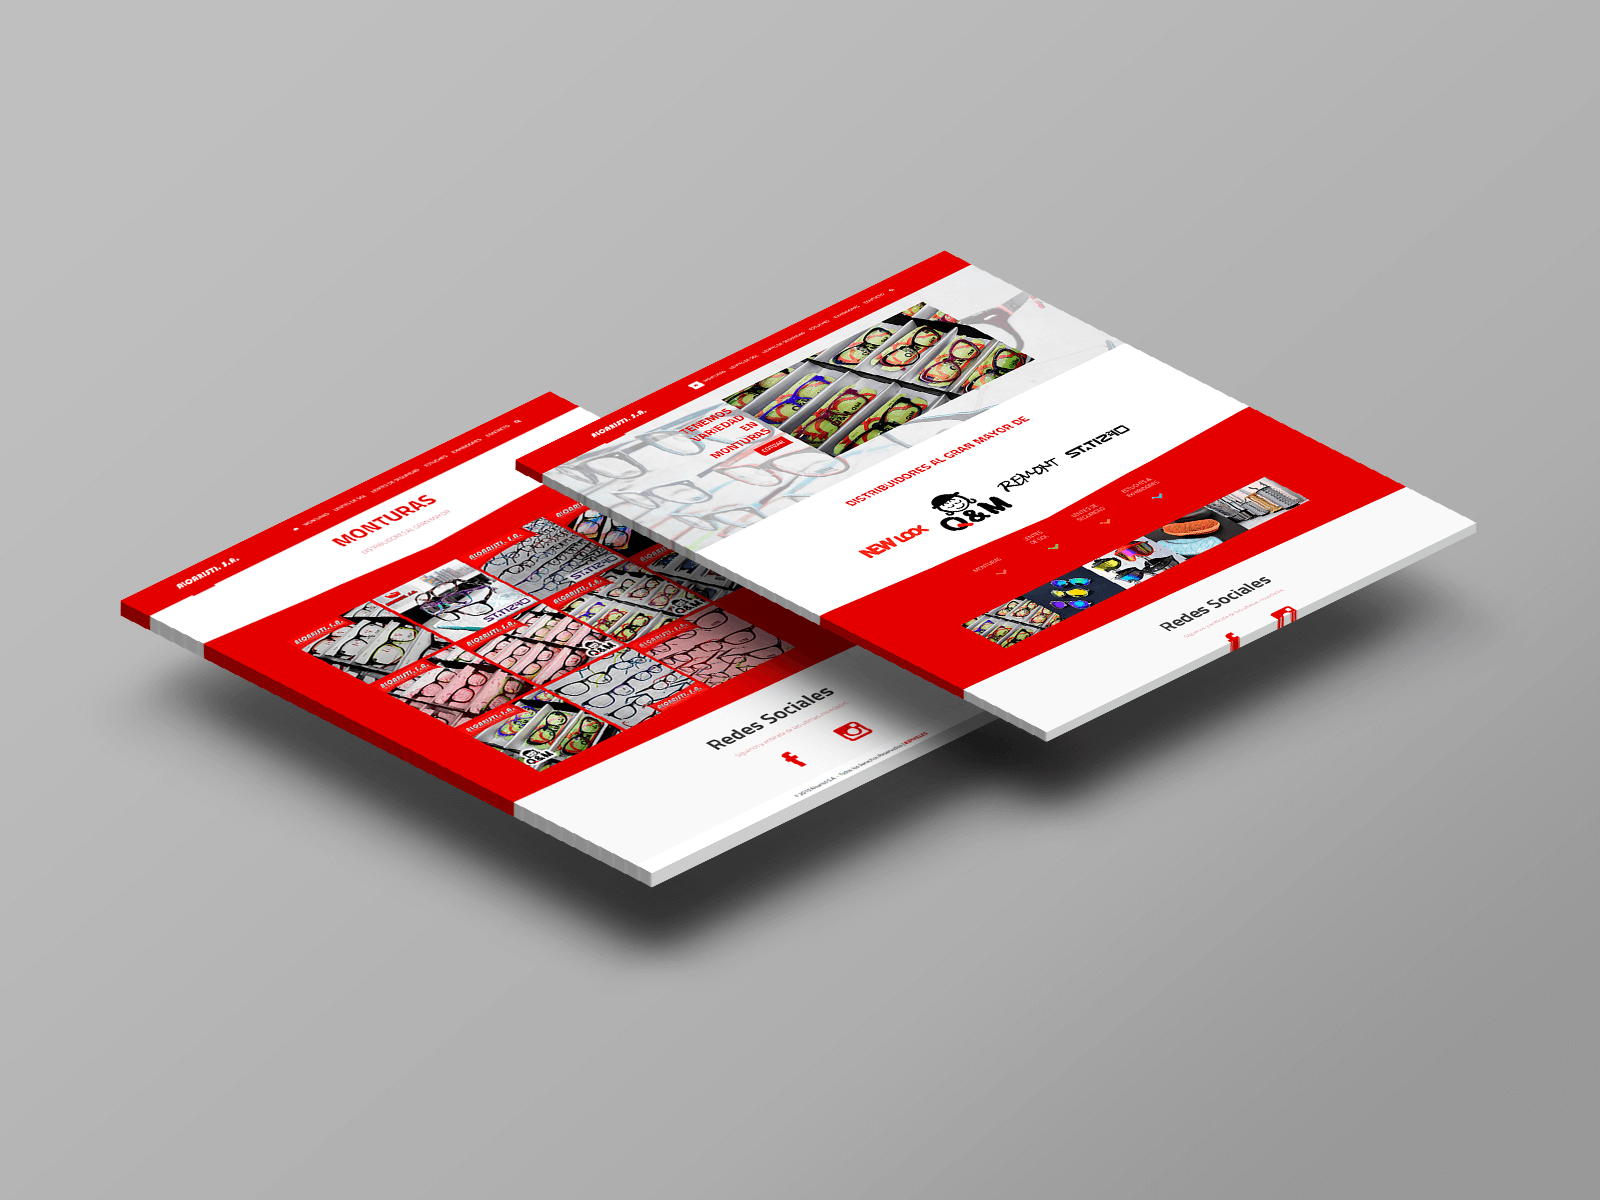 83pixeles | Aloaristi, S.A. | Diseño Web Adaptativo en Panamá